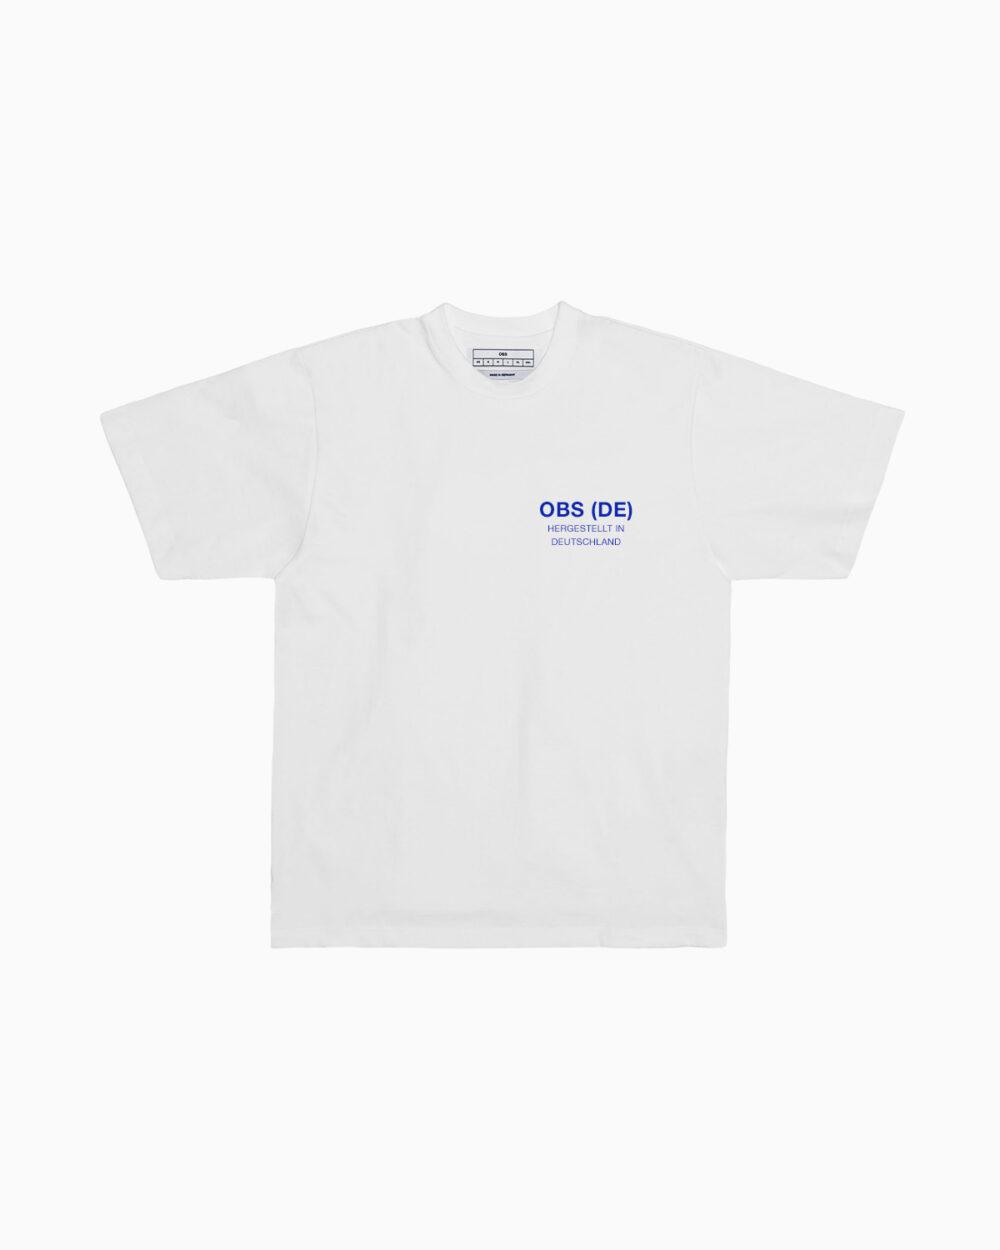 OBS (DE) Hergestellt in Deutschland T-Shirt / Small Blue Logo